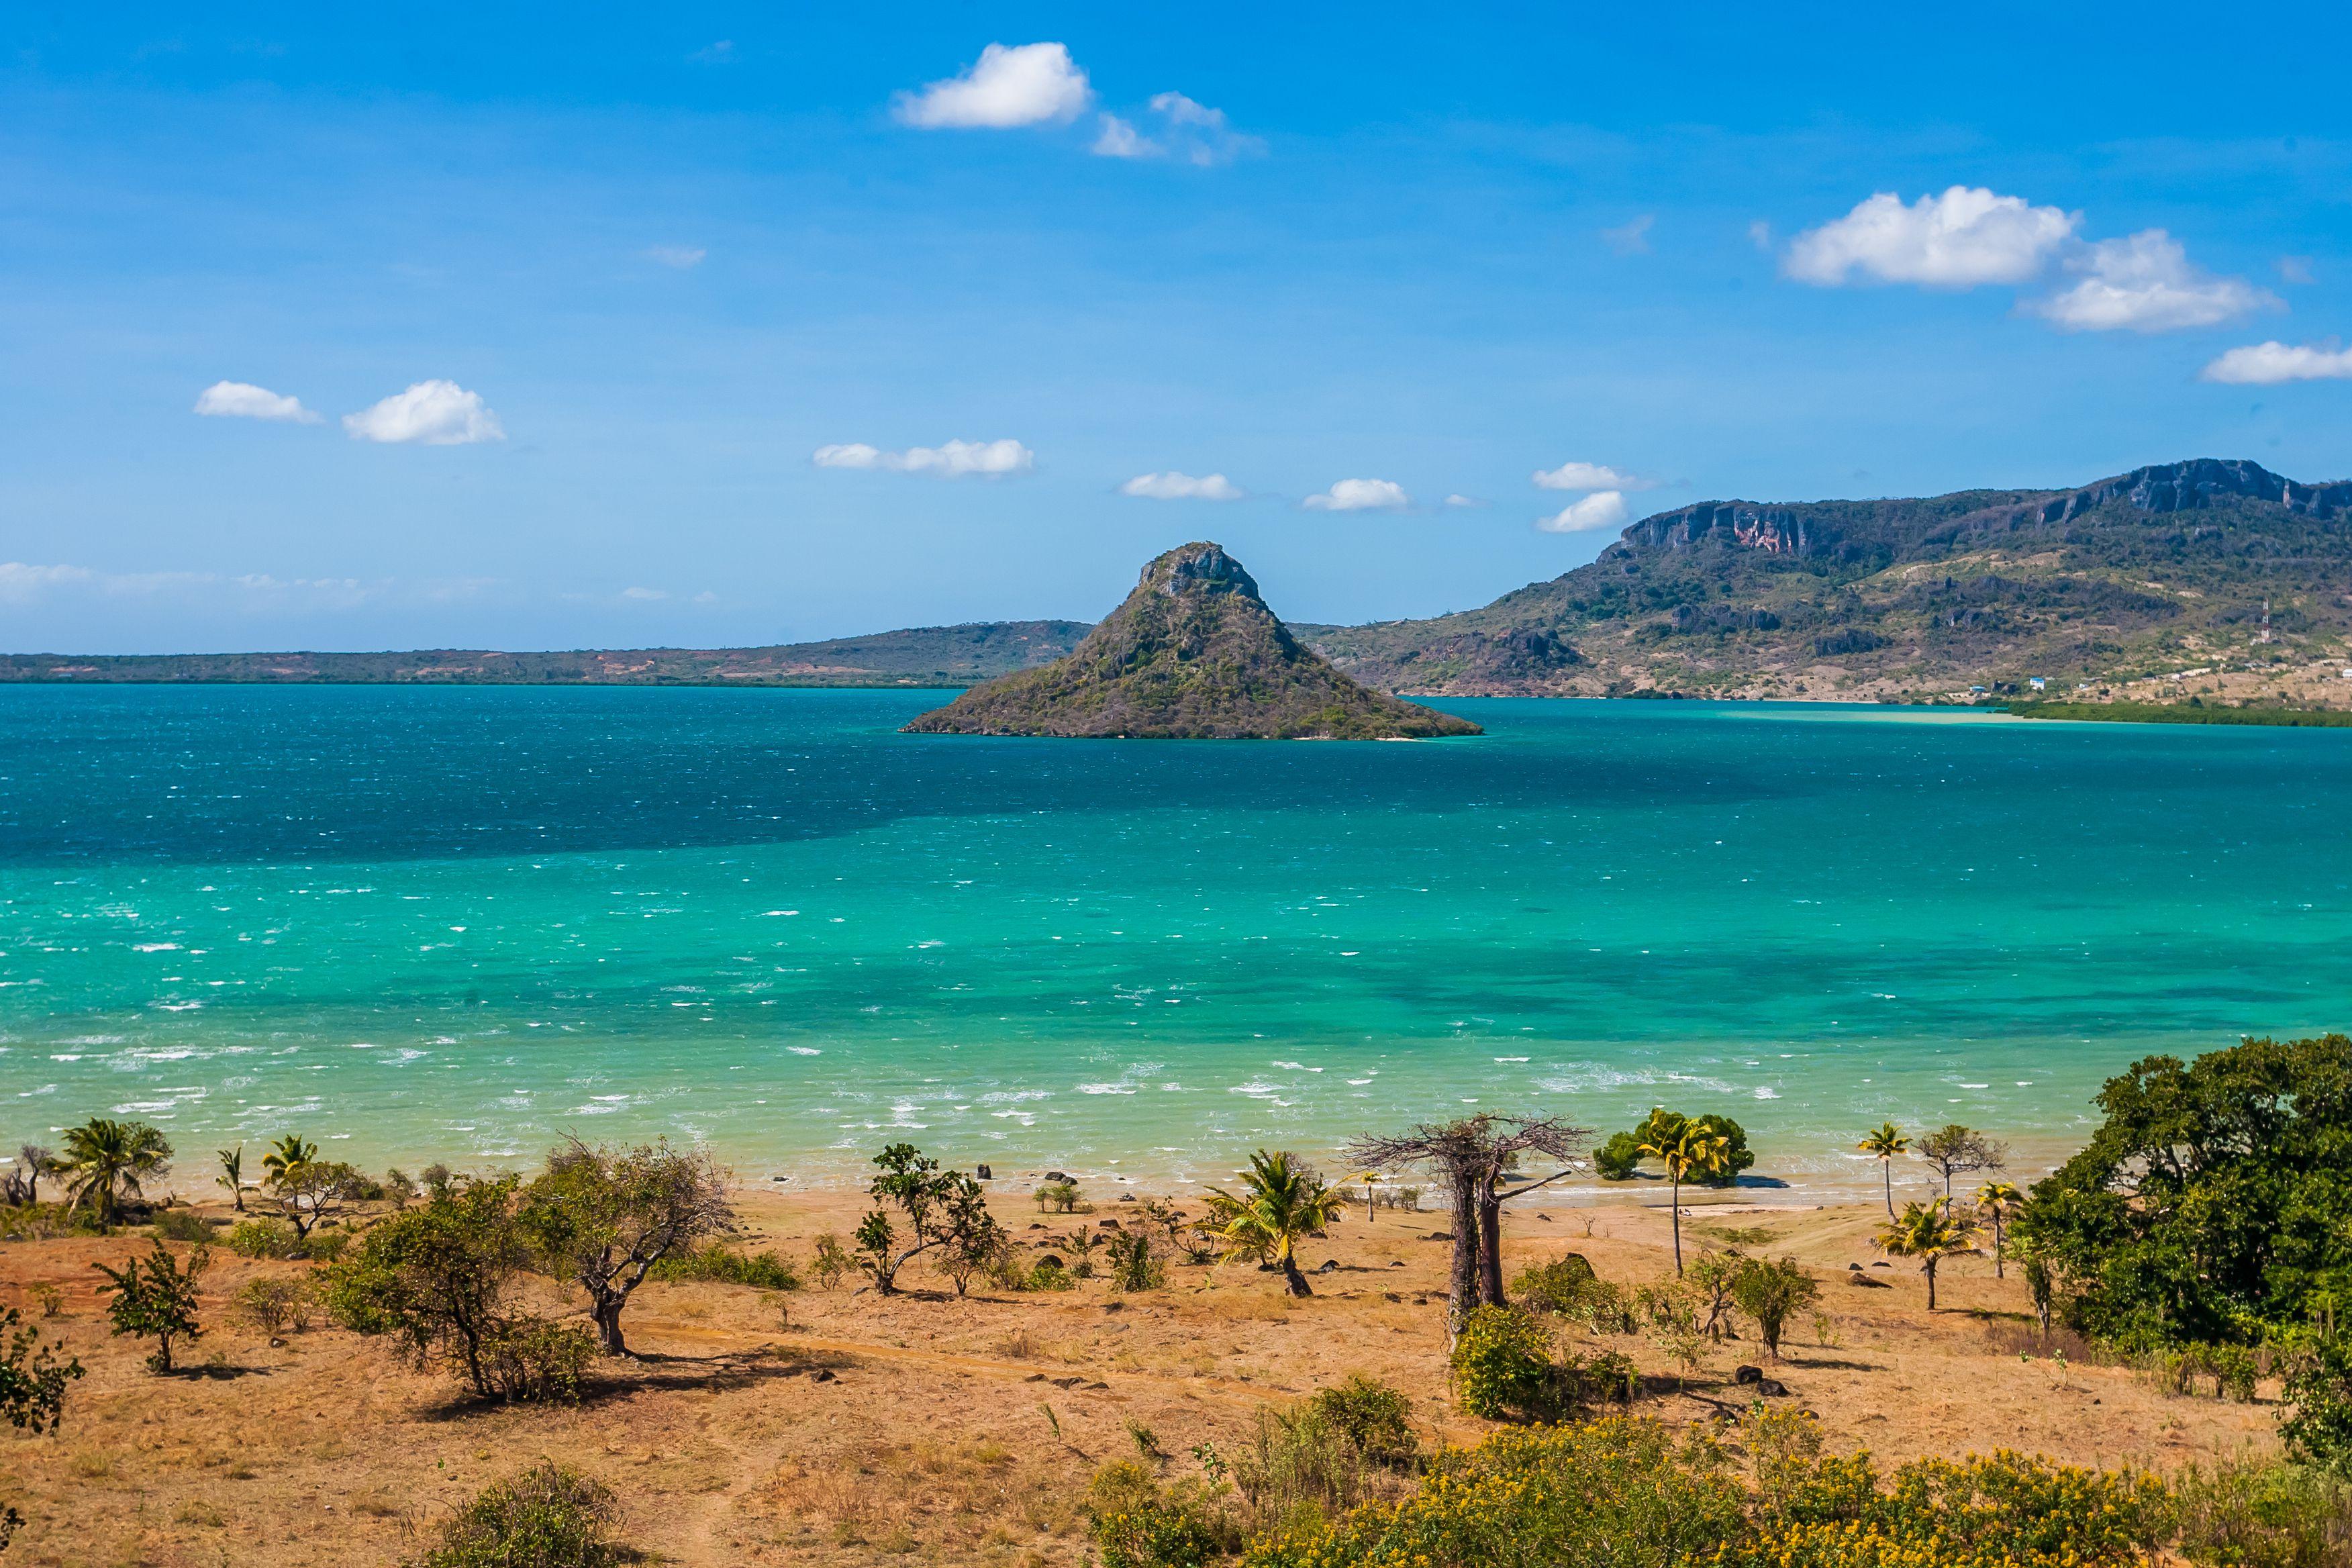 Sugarloaf of Antsiranana bay, northern Madagascar